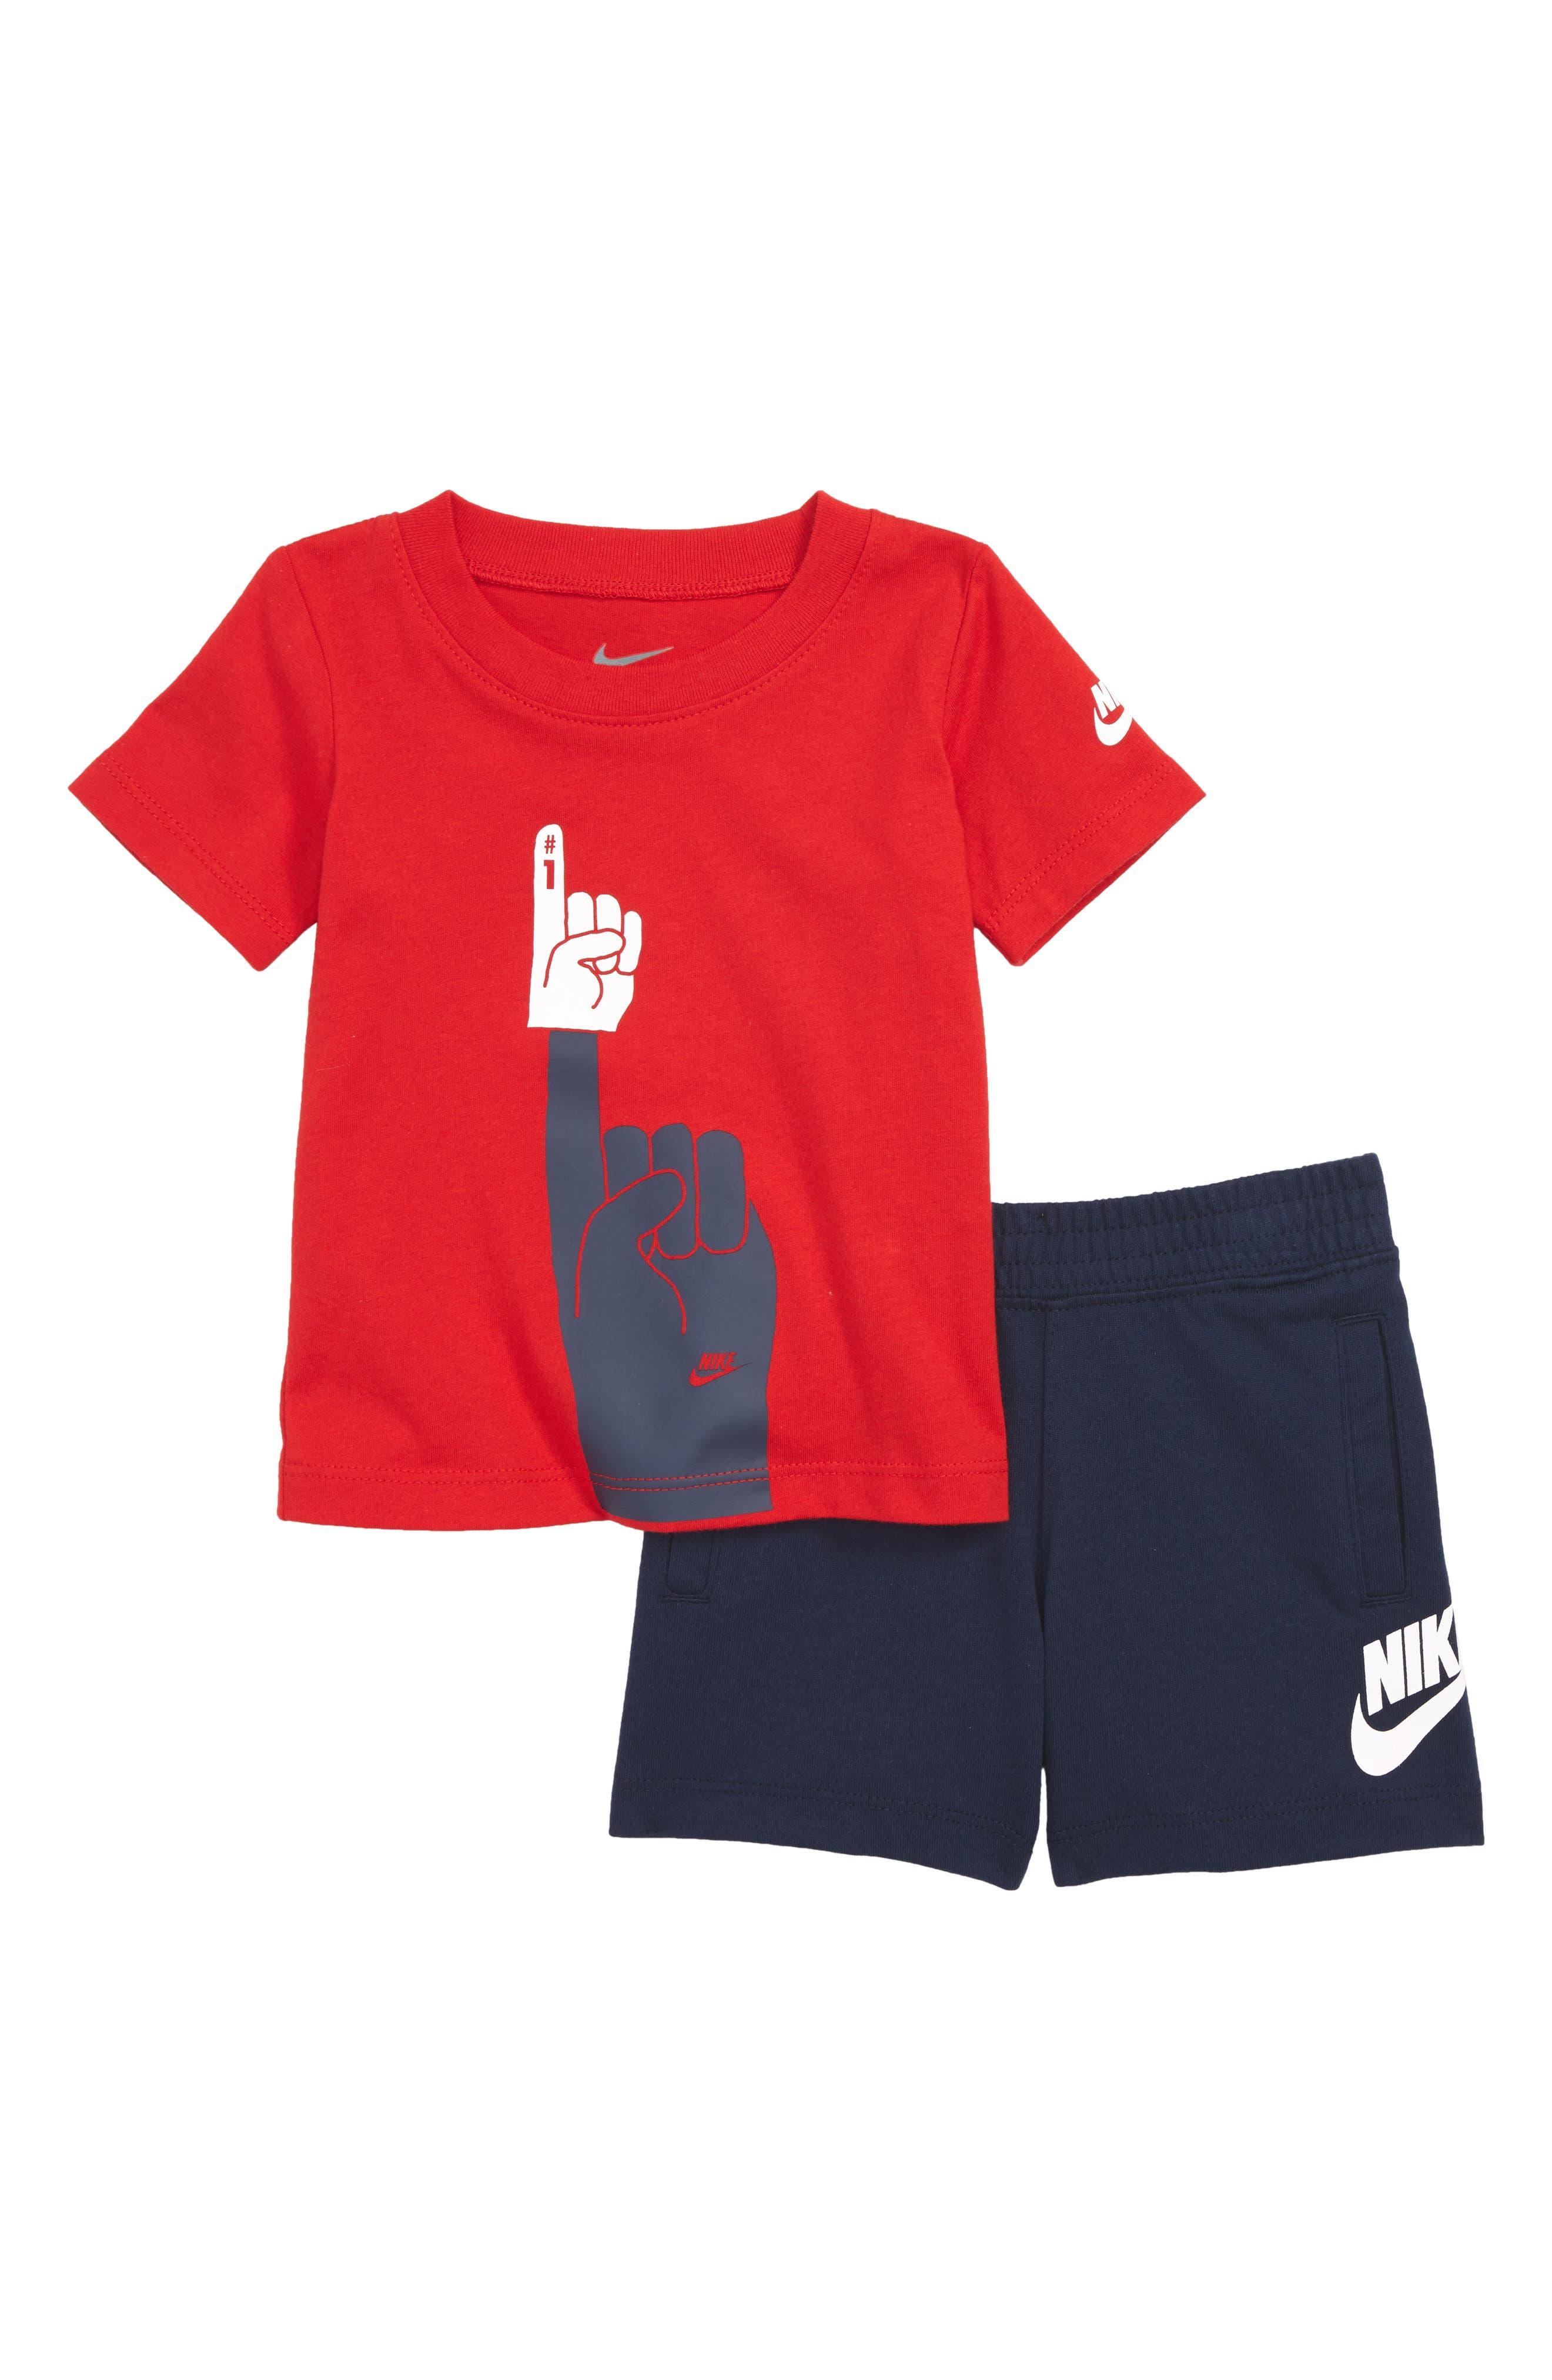 Nike Futura Foam Finger Graphic T-Shirt & Knit Shorts Set (Baby Boys)